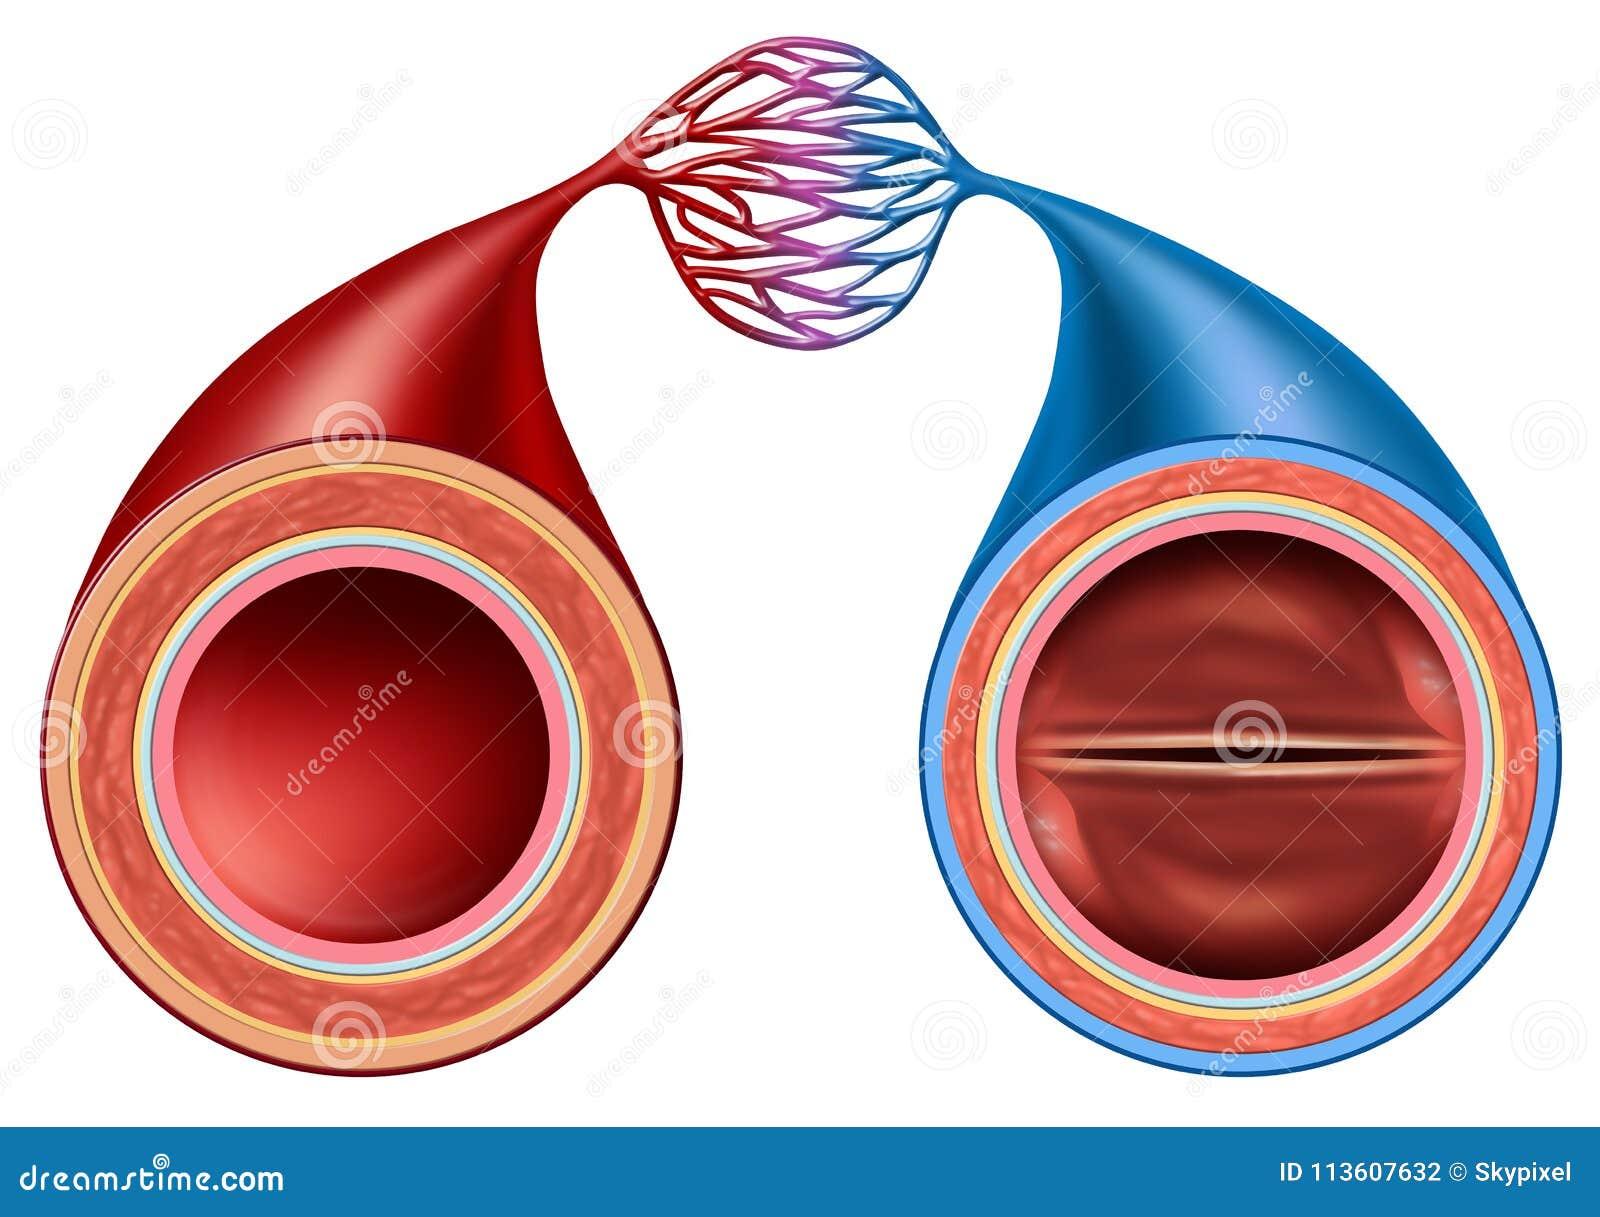 Artery And Vein Stock Illustration Illustration Of Biology 113607632